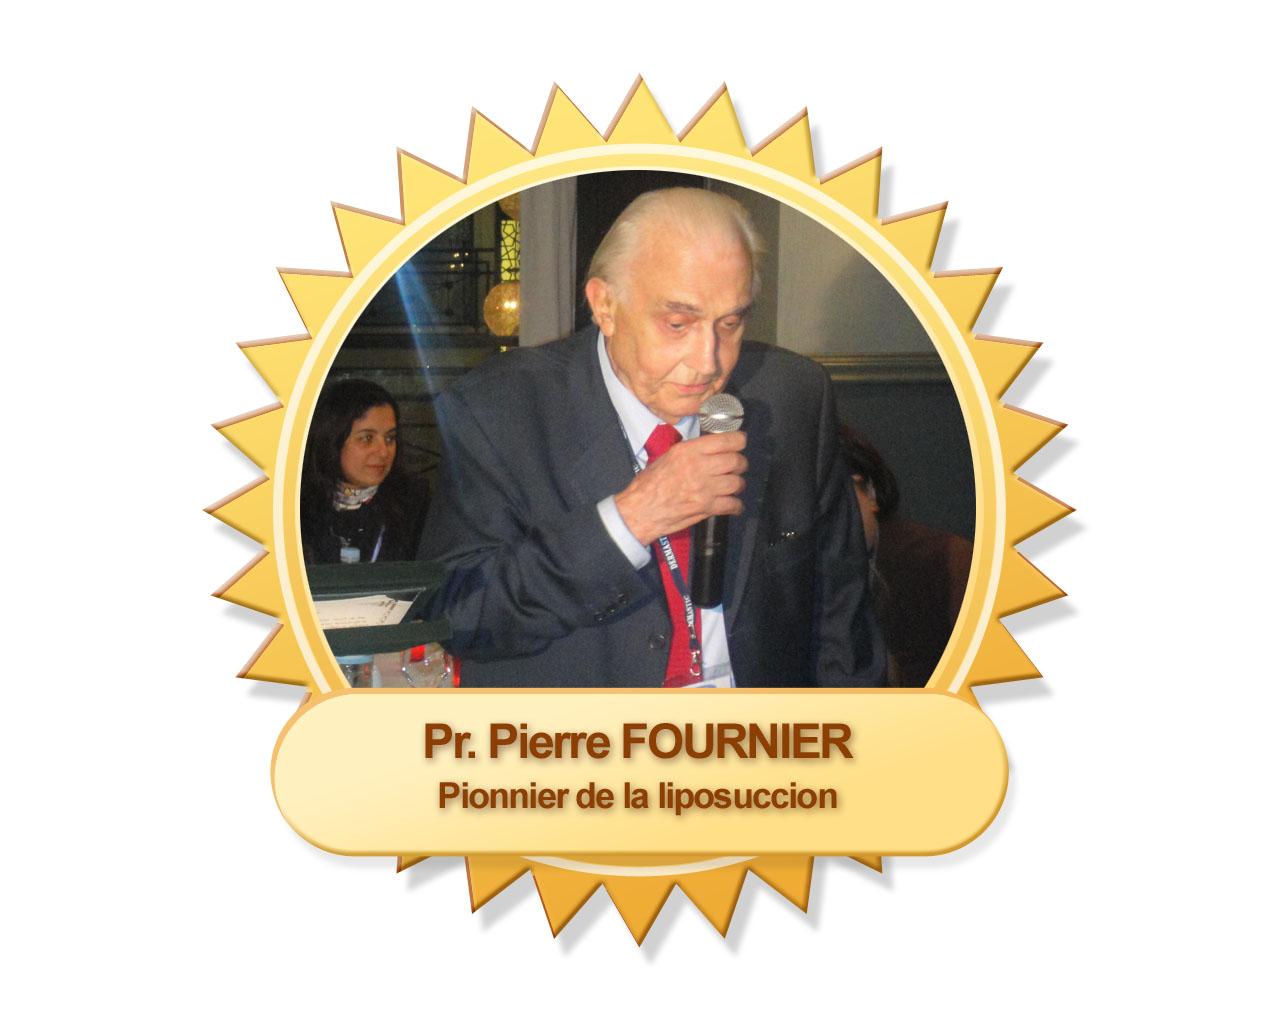 Pr. fournier